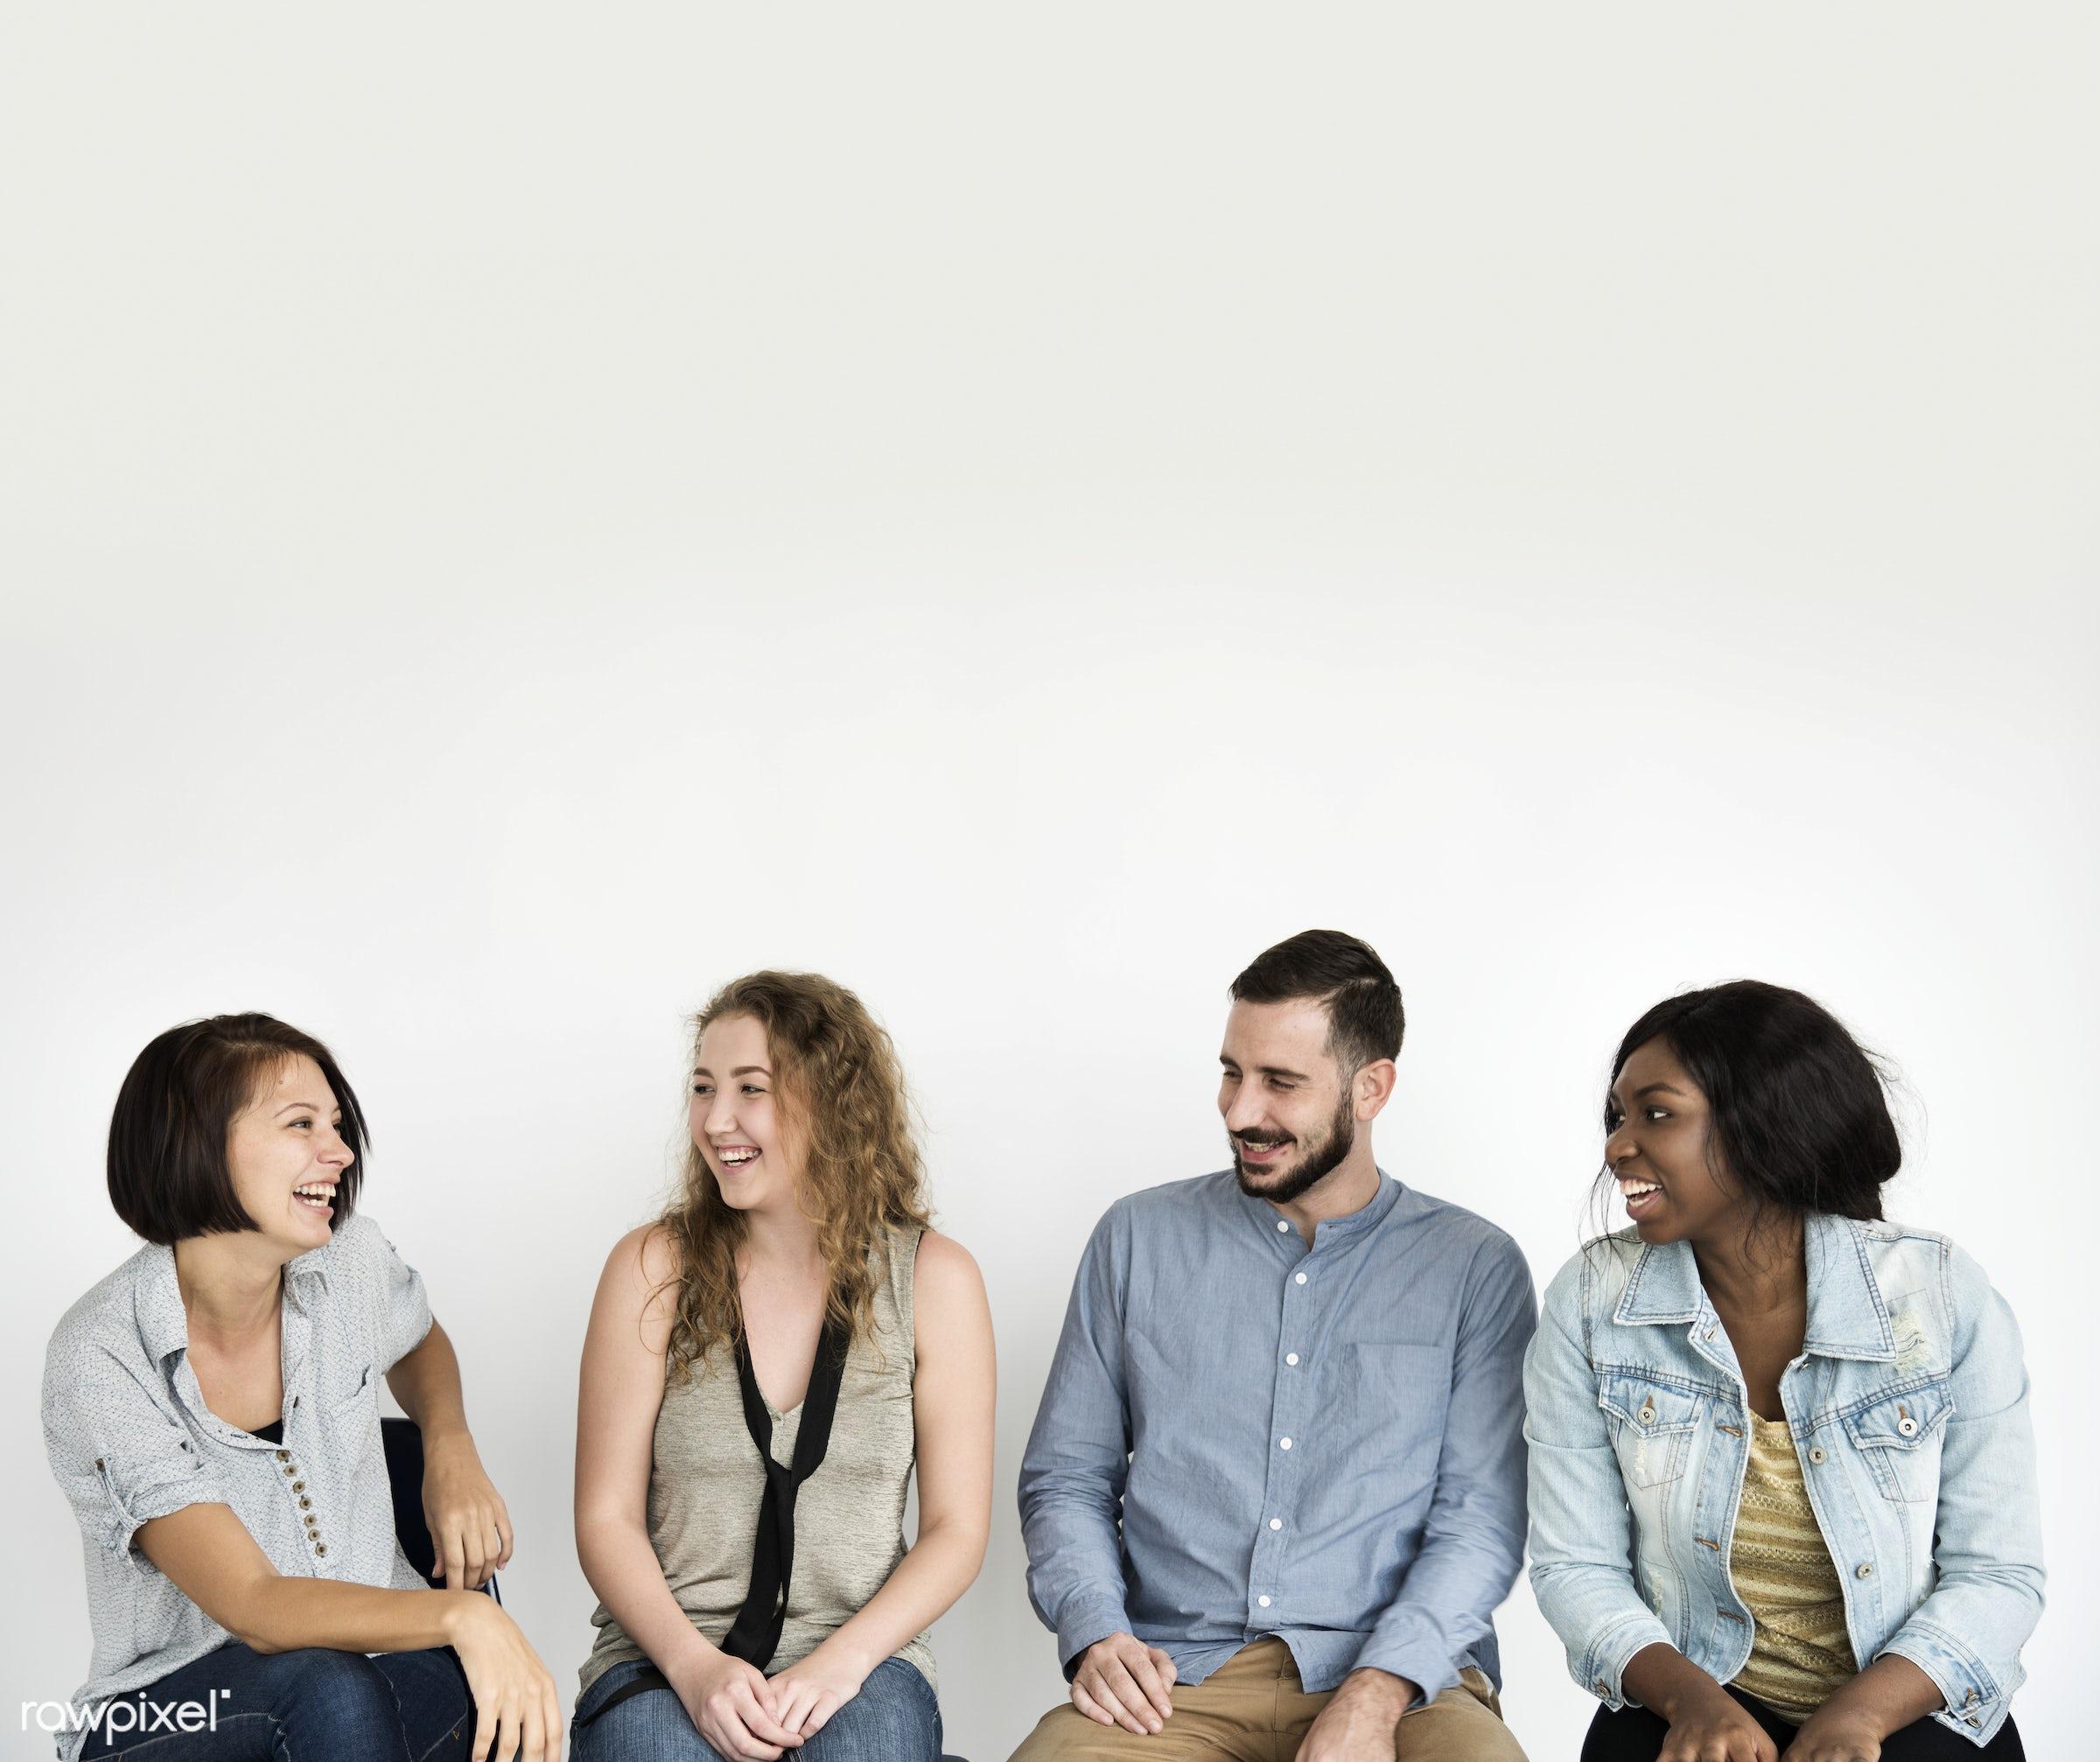 studio, discussion, diverse, socialize, people, caucasian, friends, girl, socializing, woman, casual, friendship,...